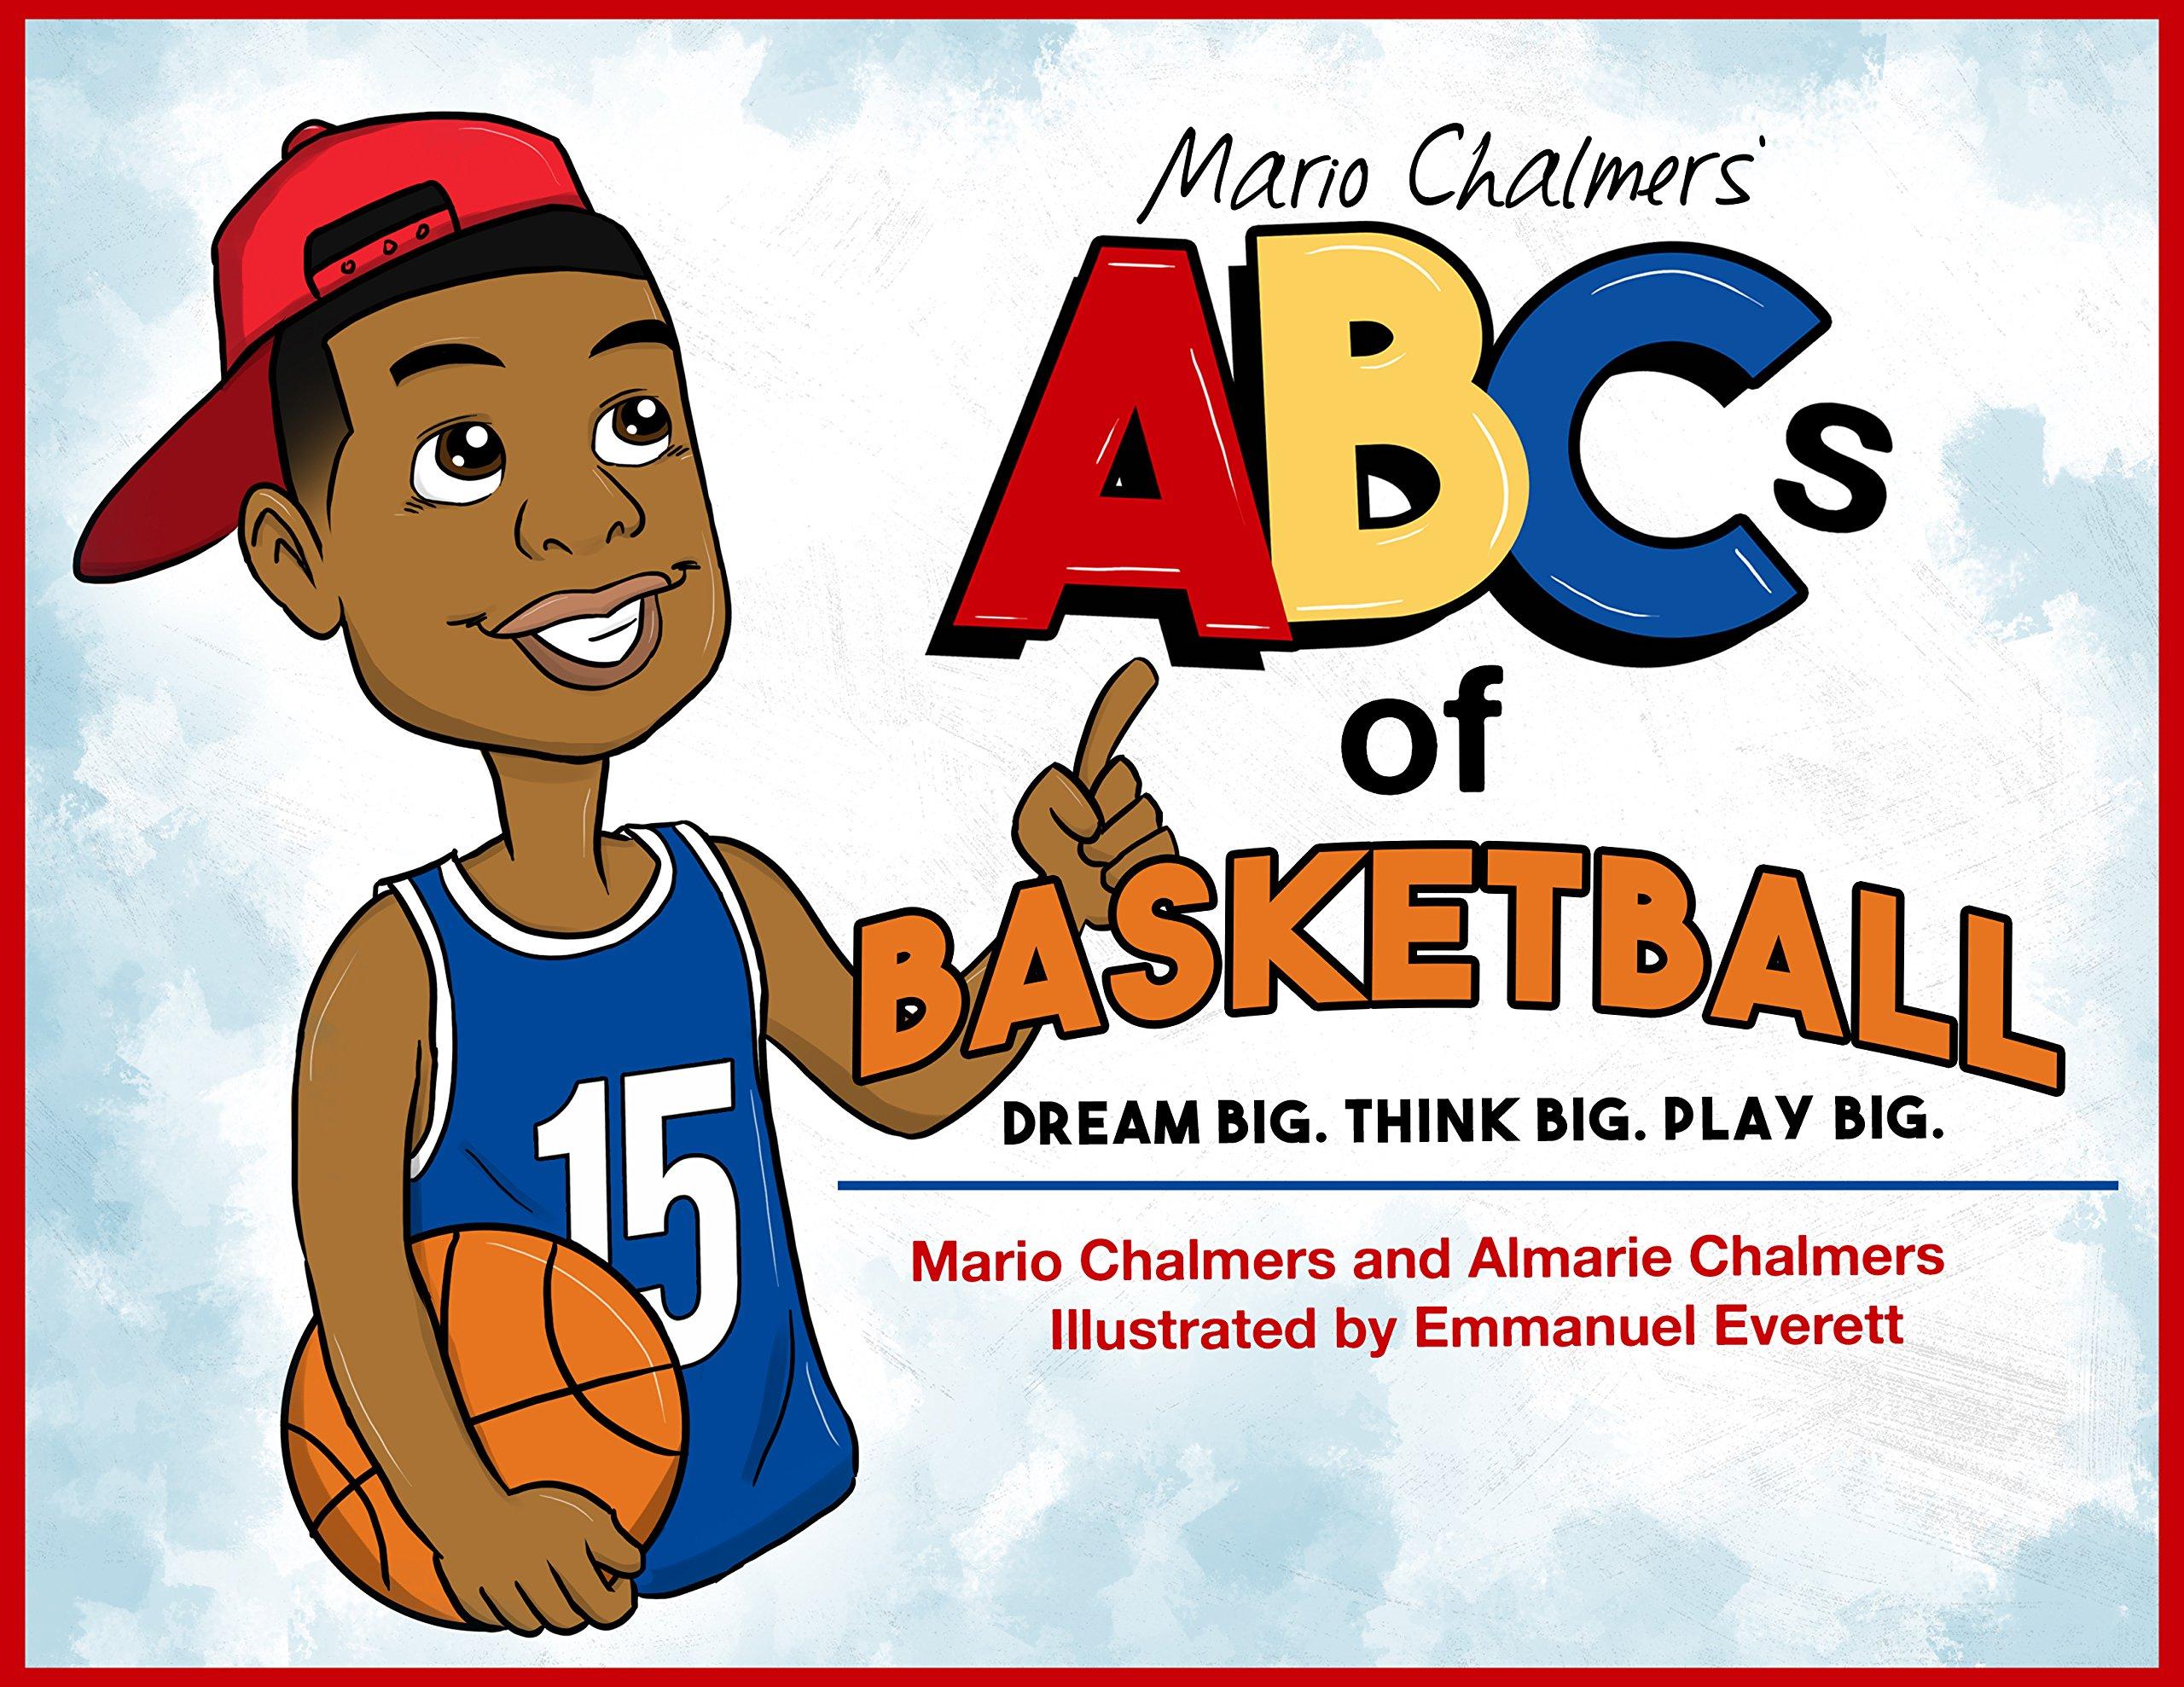 Mario Chalmers' ABCs of Basketball, Dream Big. Think Big. Play Big